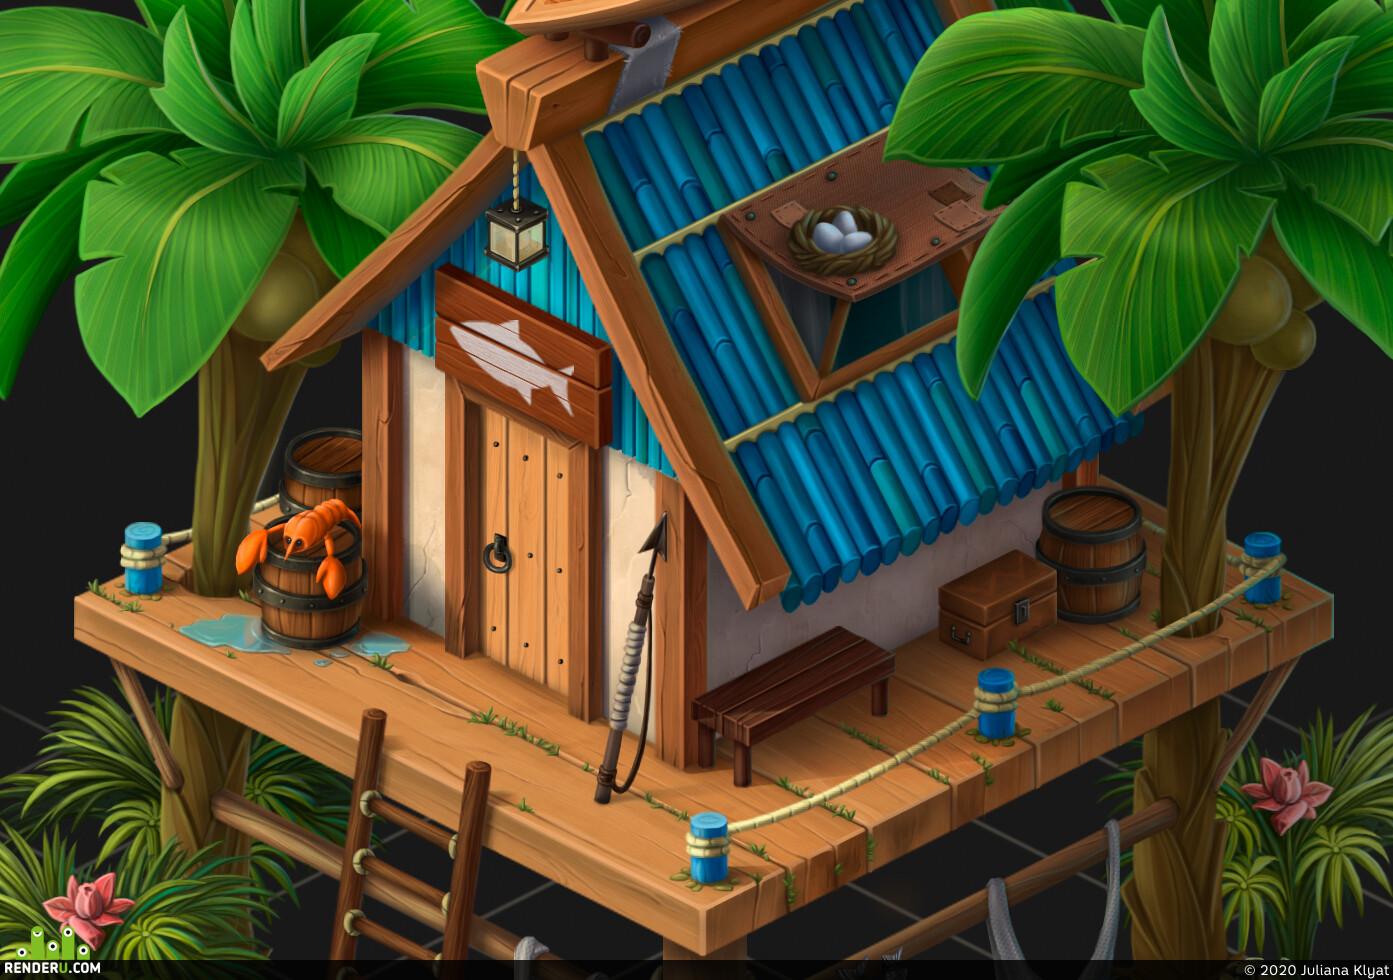 house, fisherman, island, palm, trees, fish, paradise island, boat, wood, barrel